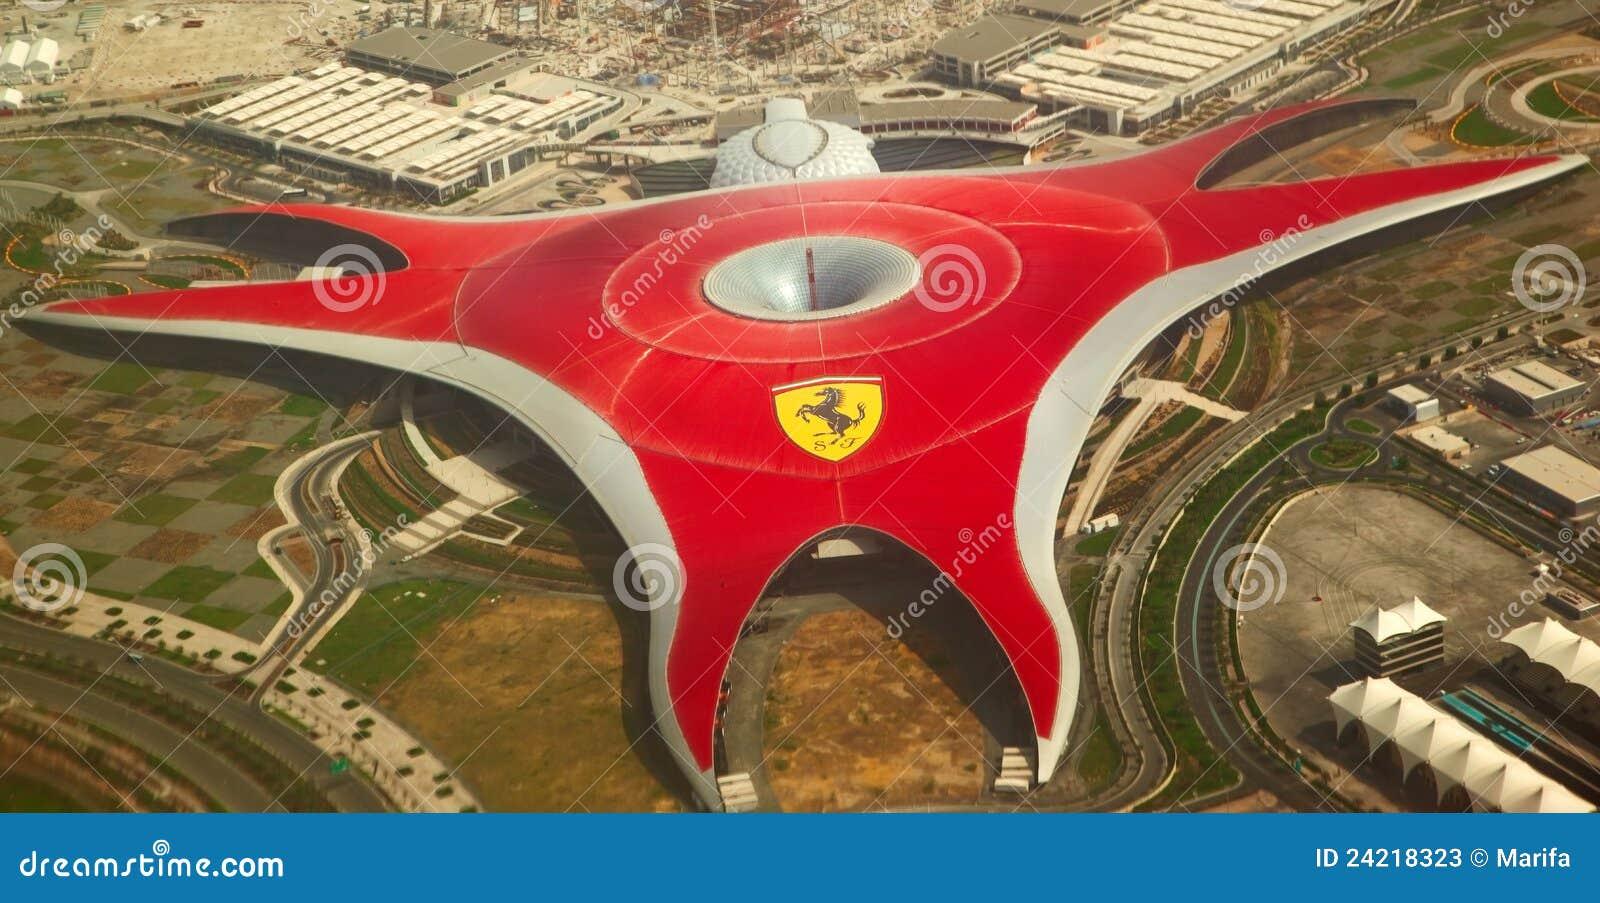 Ferrari World Roller Coaster